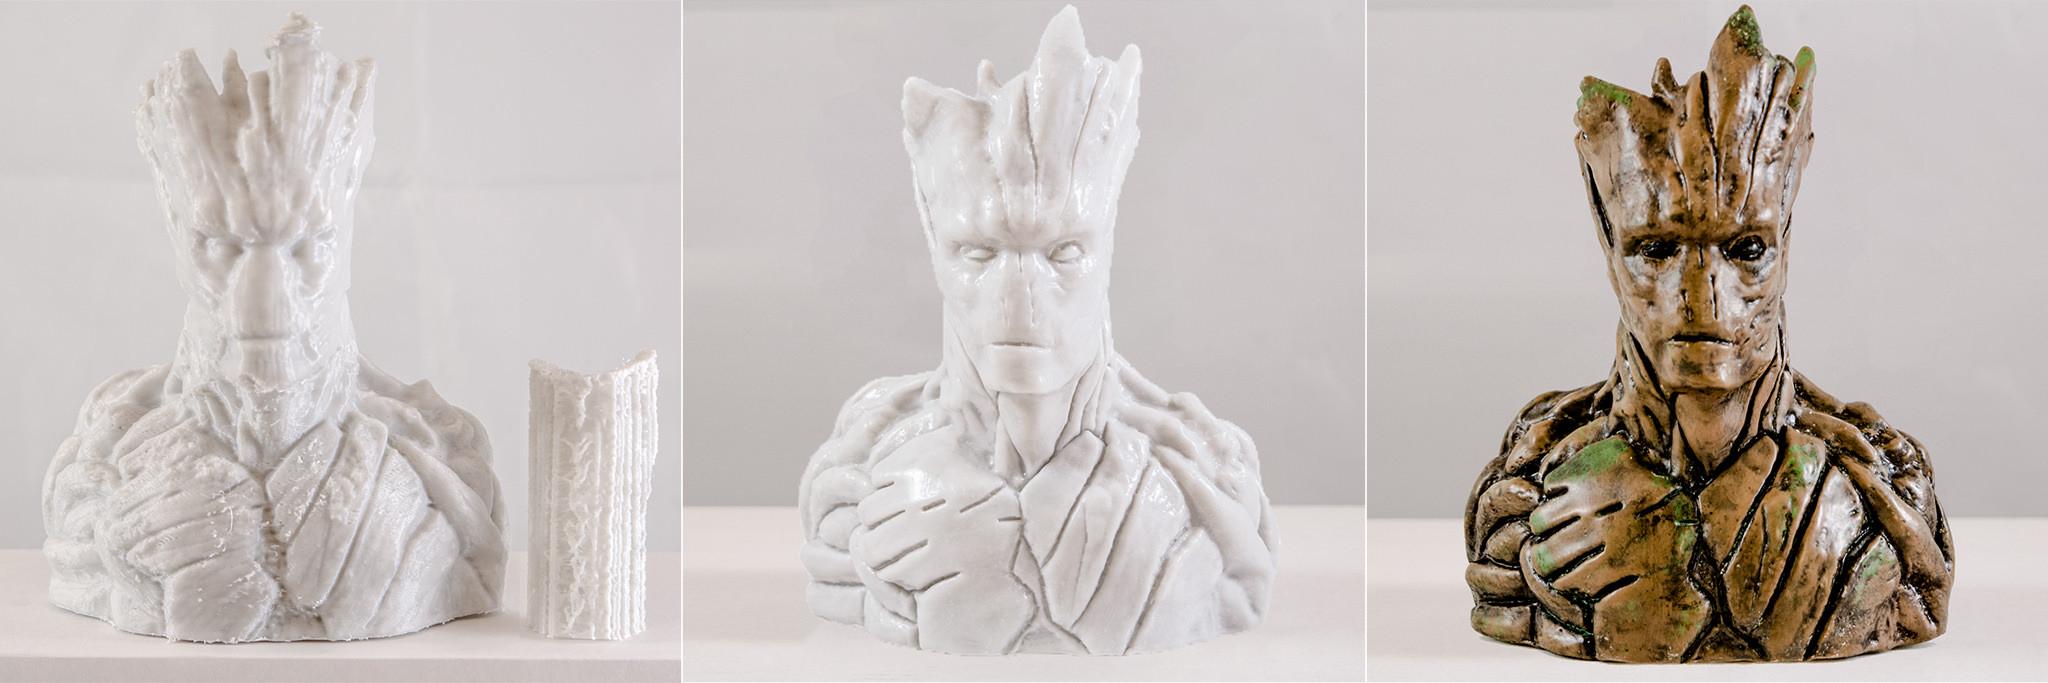 3Dプリント後に彫刻や肉盛りができるフィラメント『Thibra3D SKULPT』販売開始